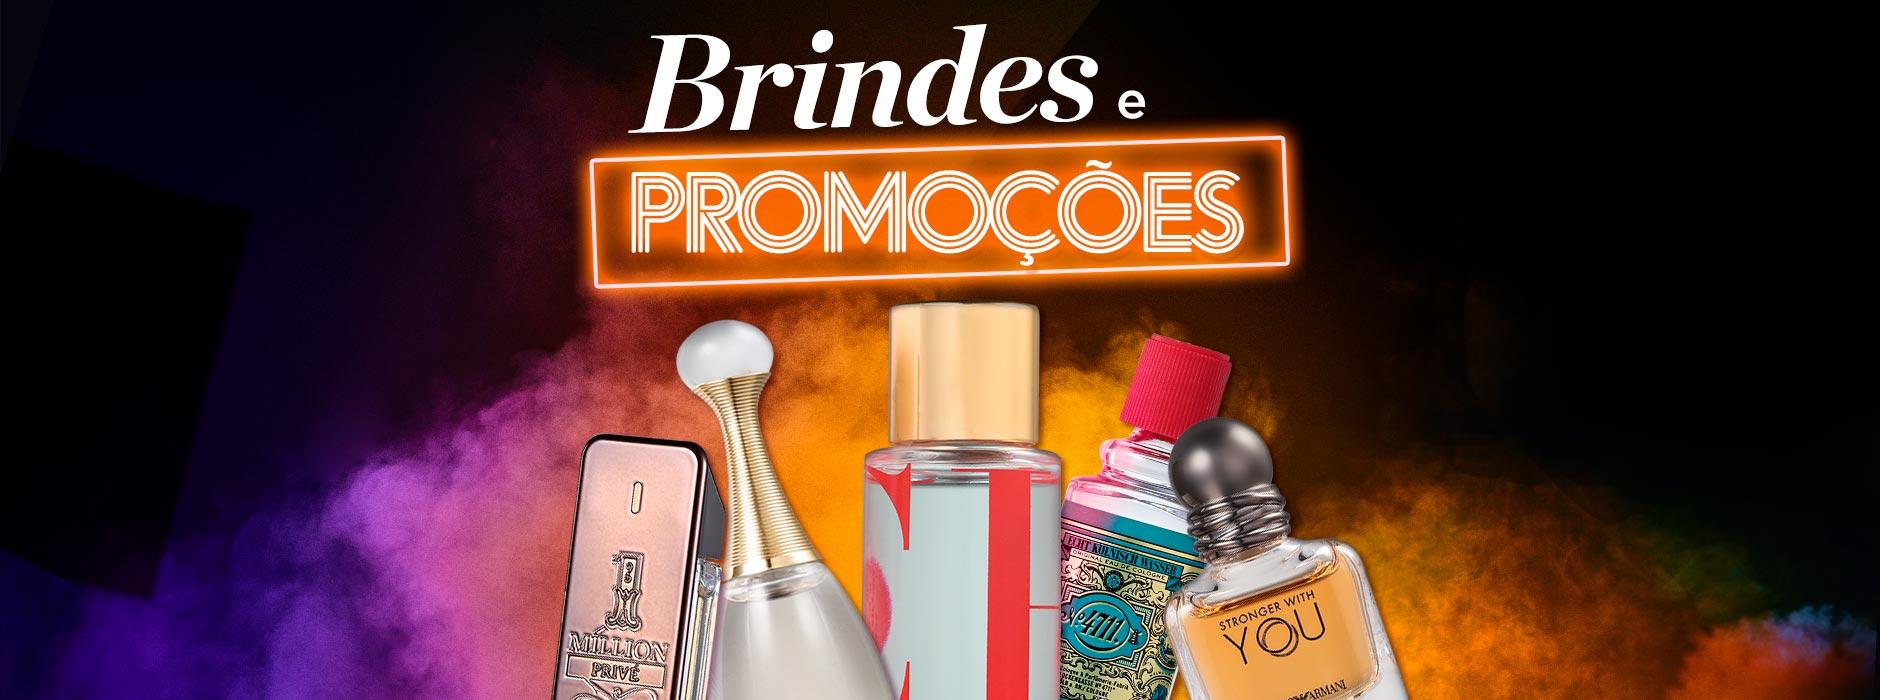 Brindes e Promoções de Perfumes